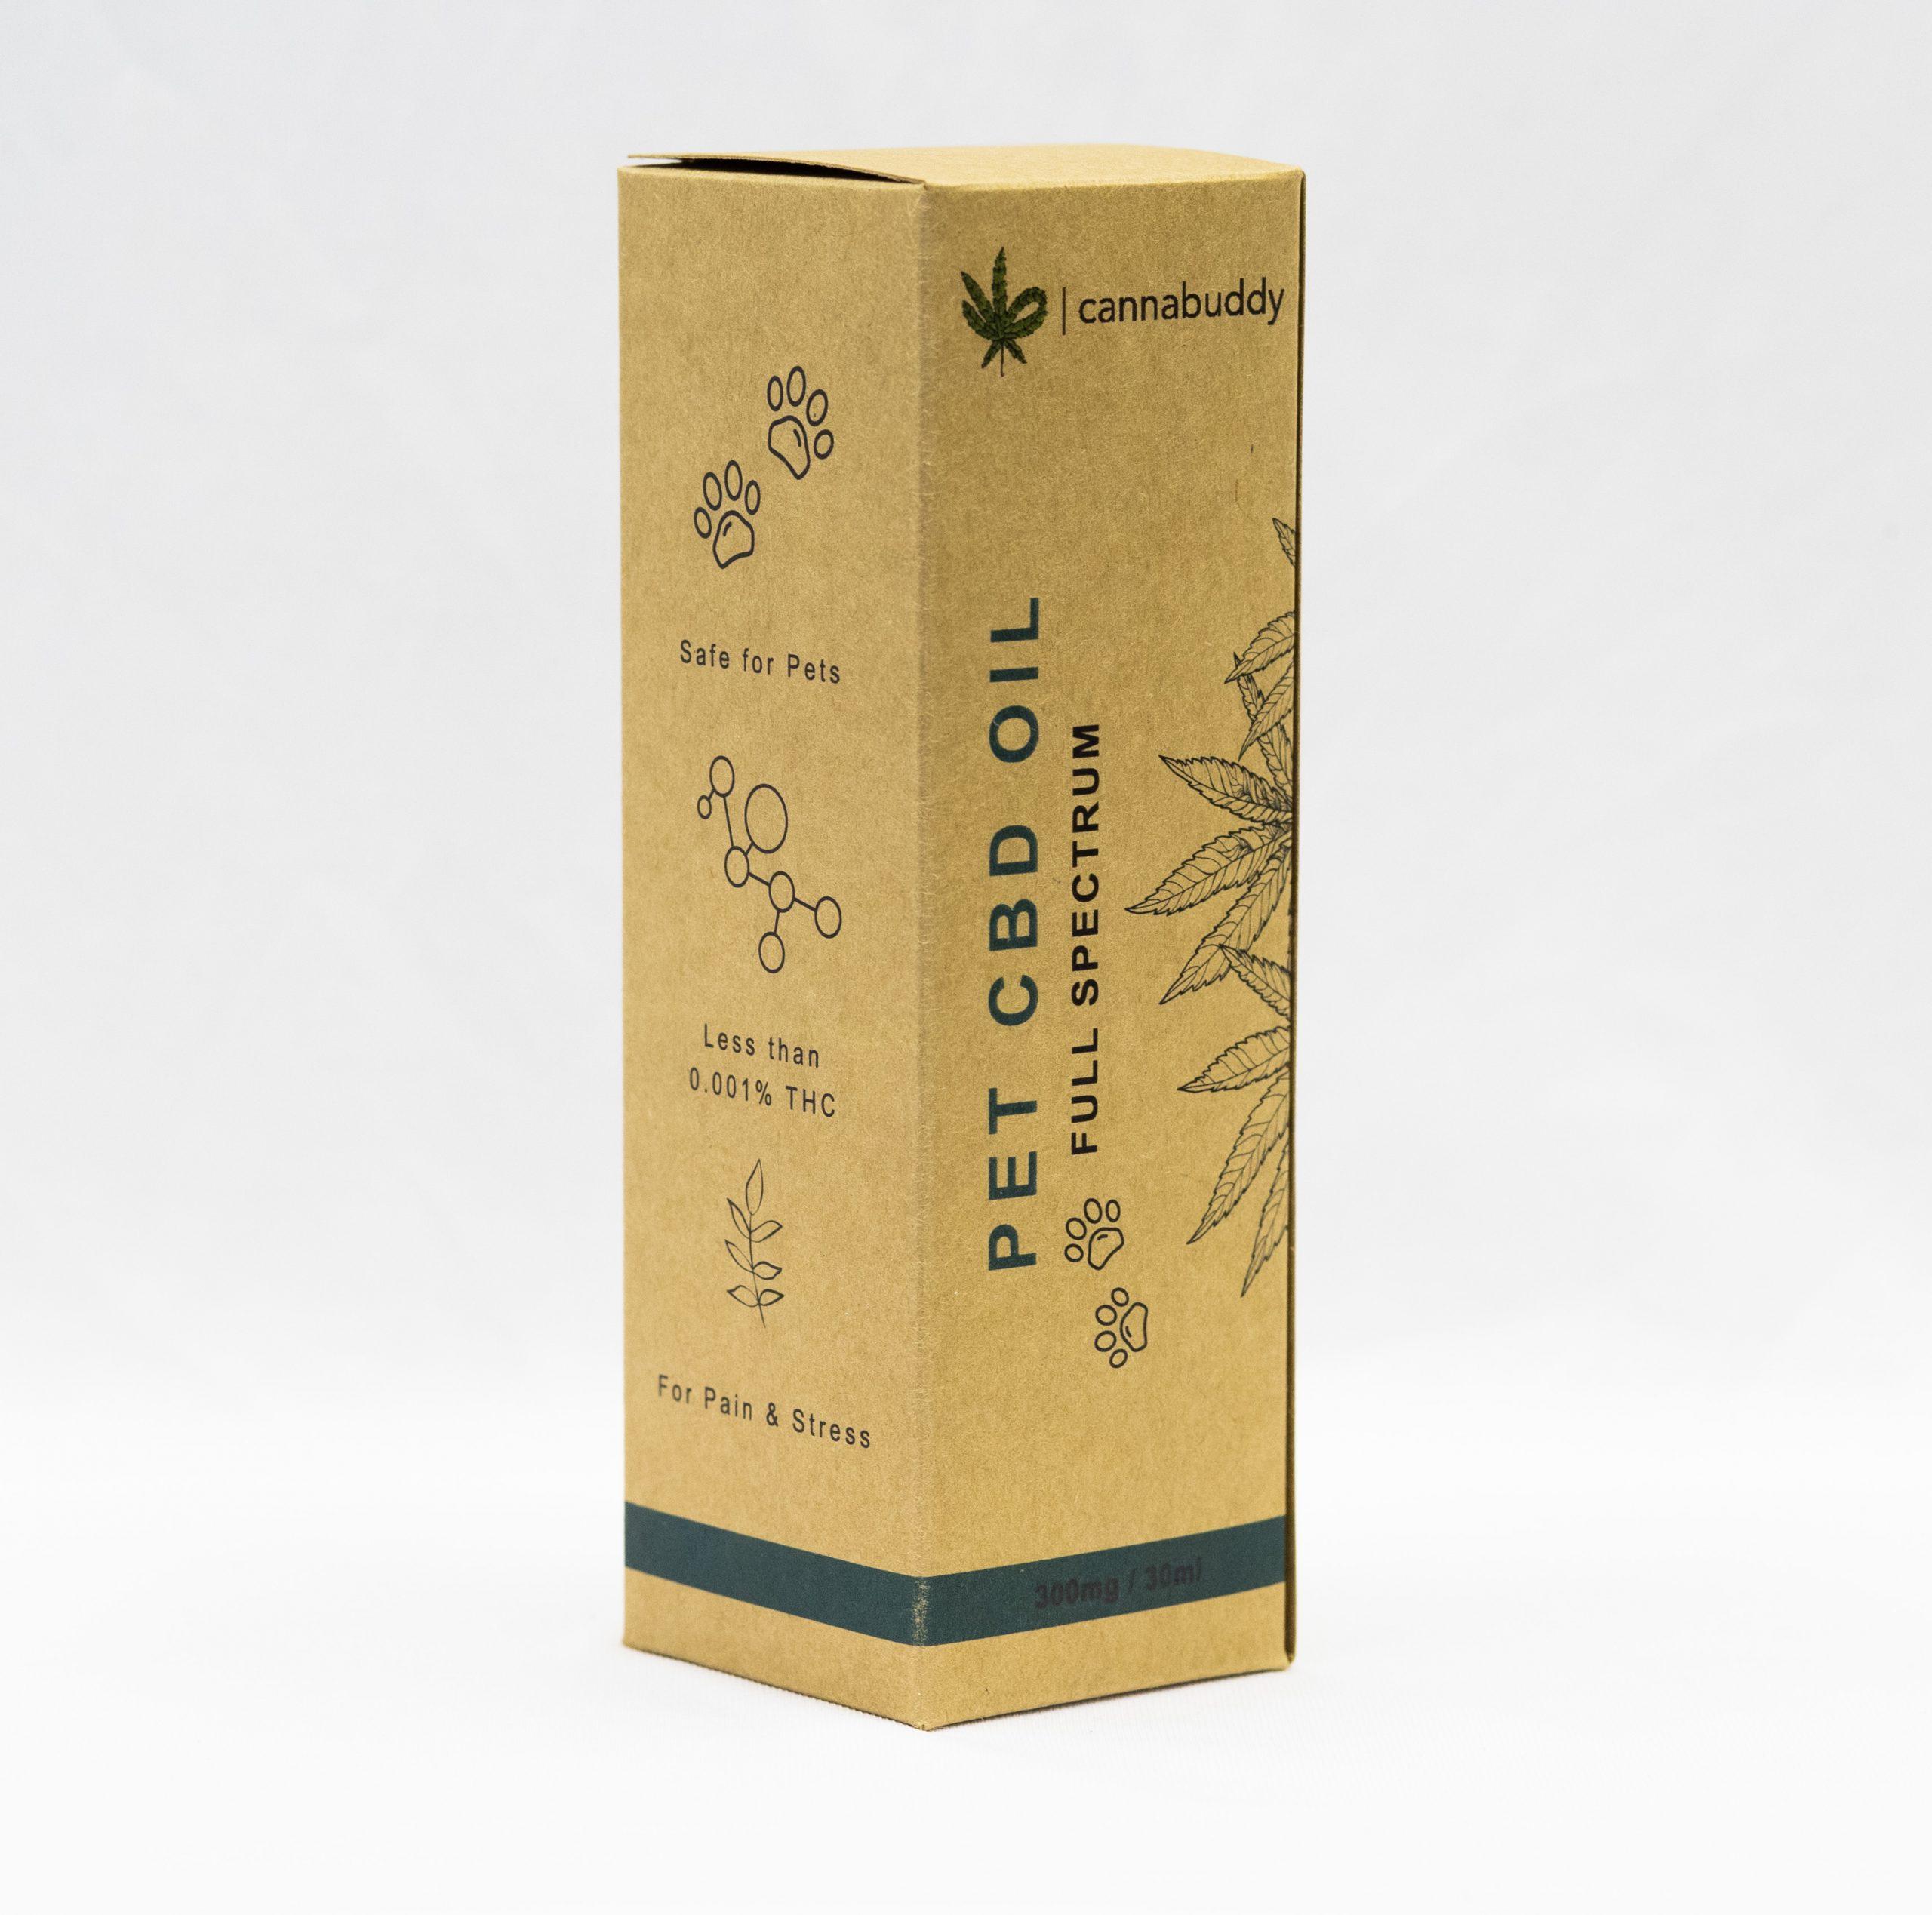 Cannabuddy CBD Pet Packaging